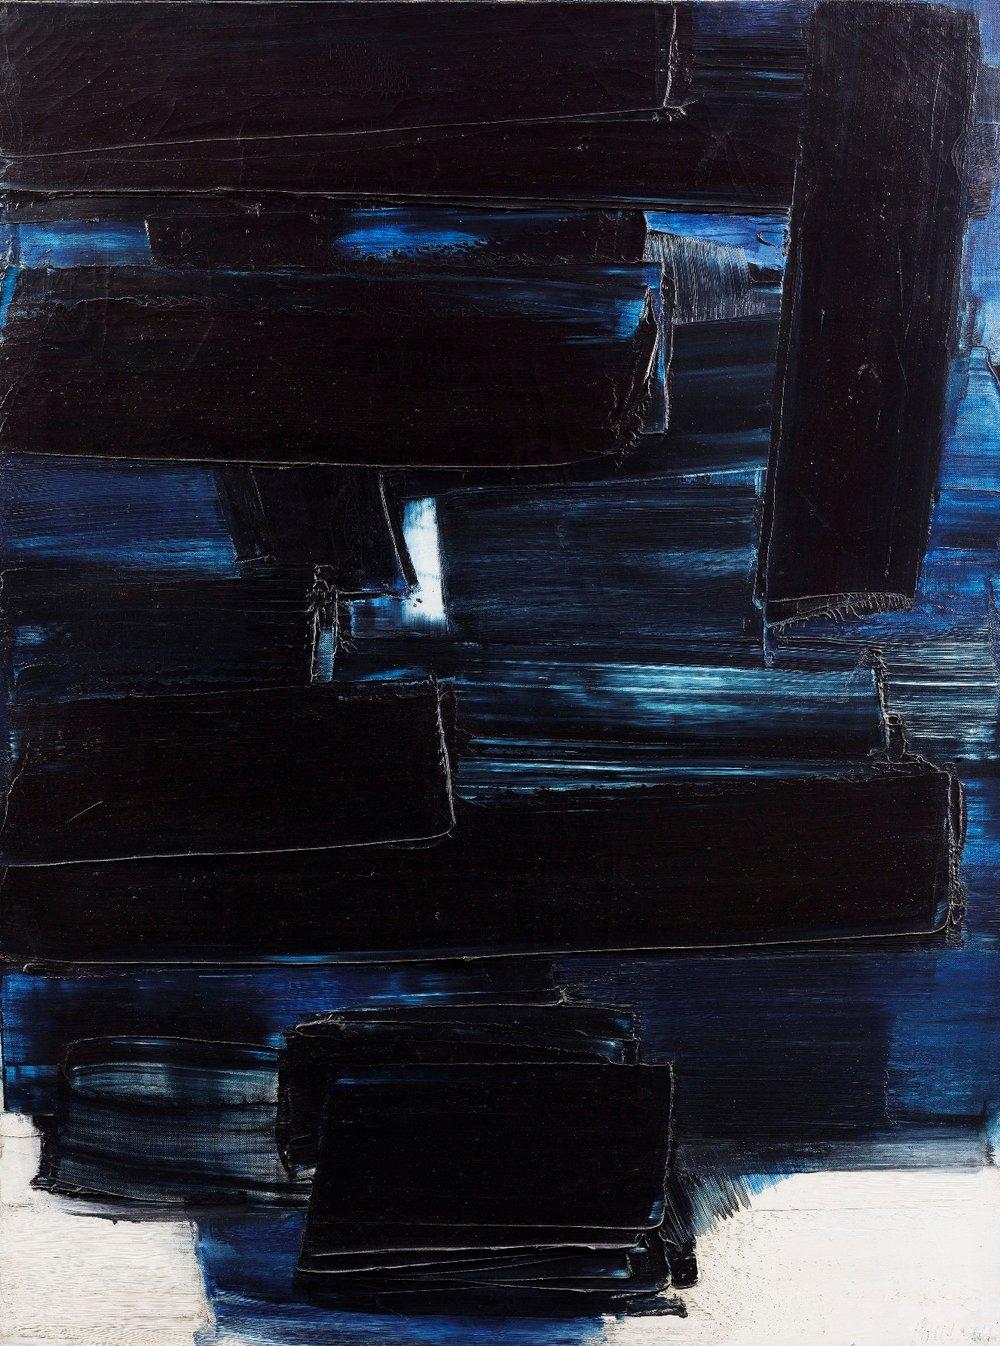 Peinture 130 x 97 cm, 5 mai 1959     Pierre Soulages     Courtoisie   Galerie Applicat-Prazan